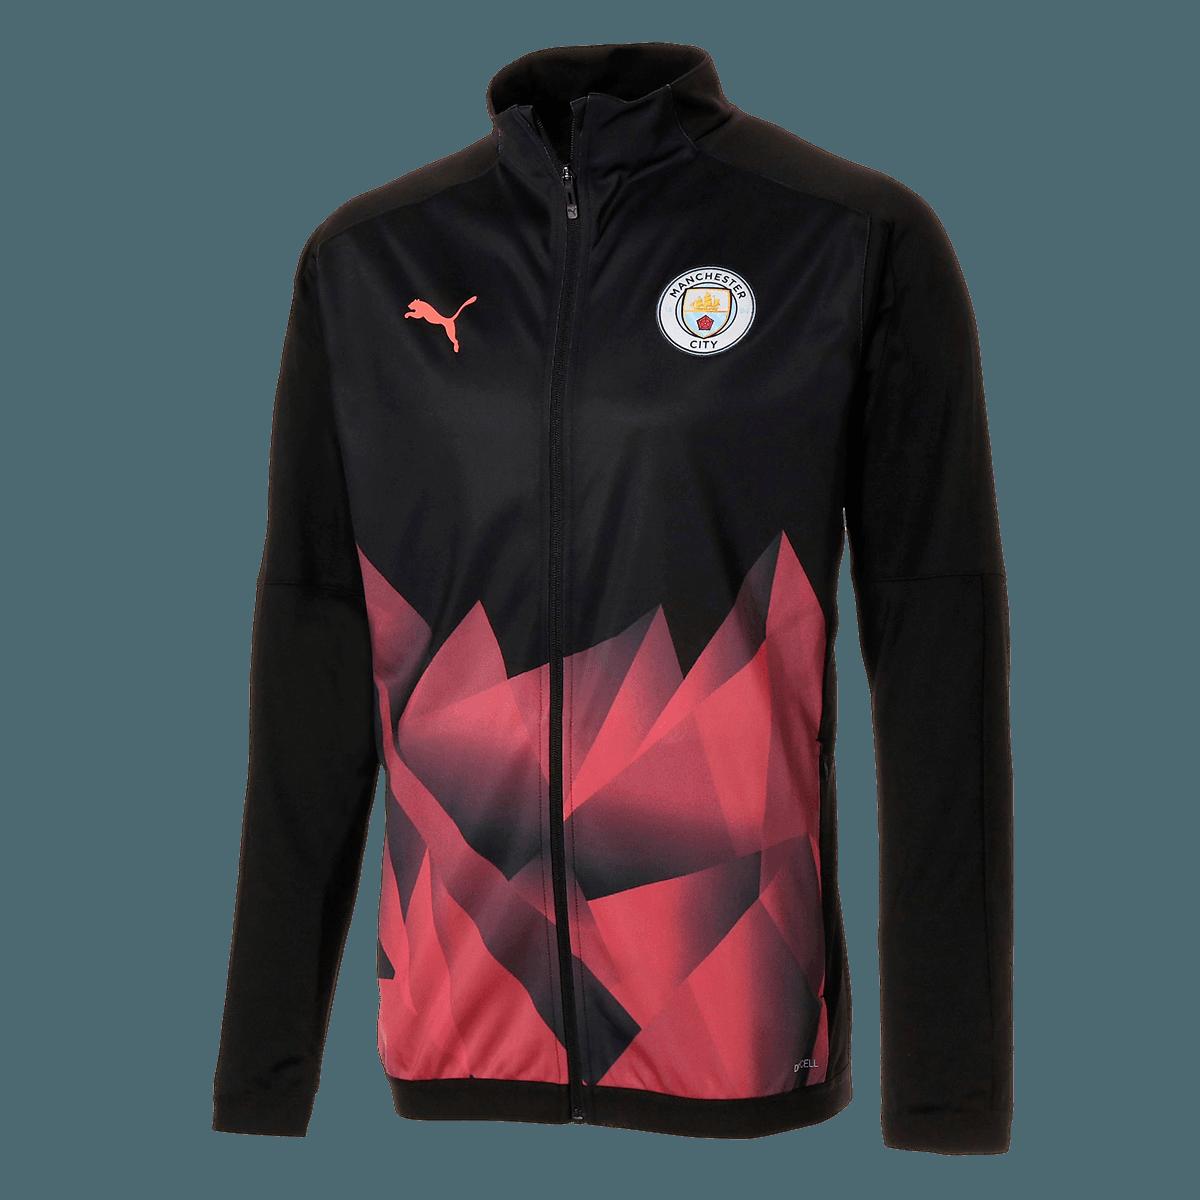 Puma Manchester City Aufwärmjacke International Stadium Jacket schwarzrot